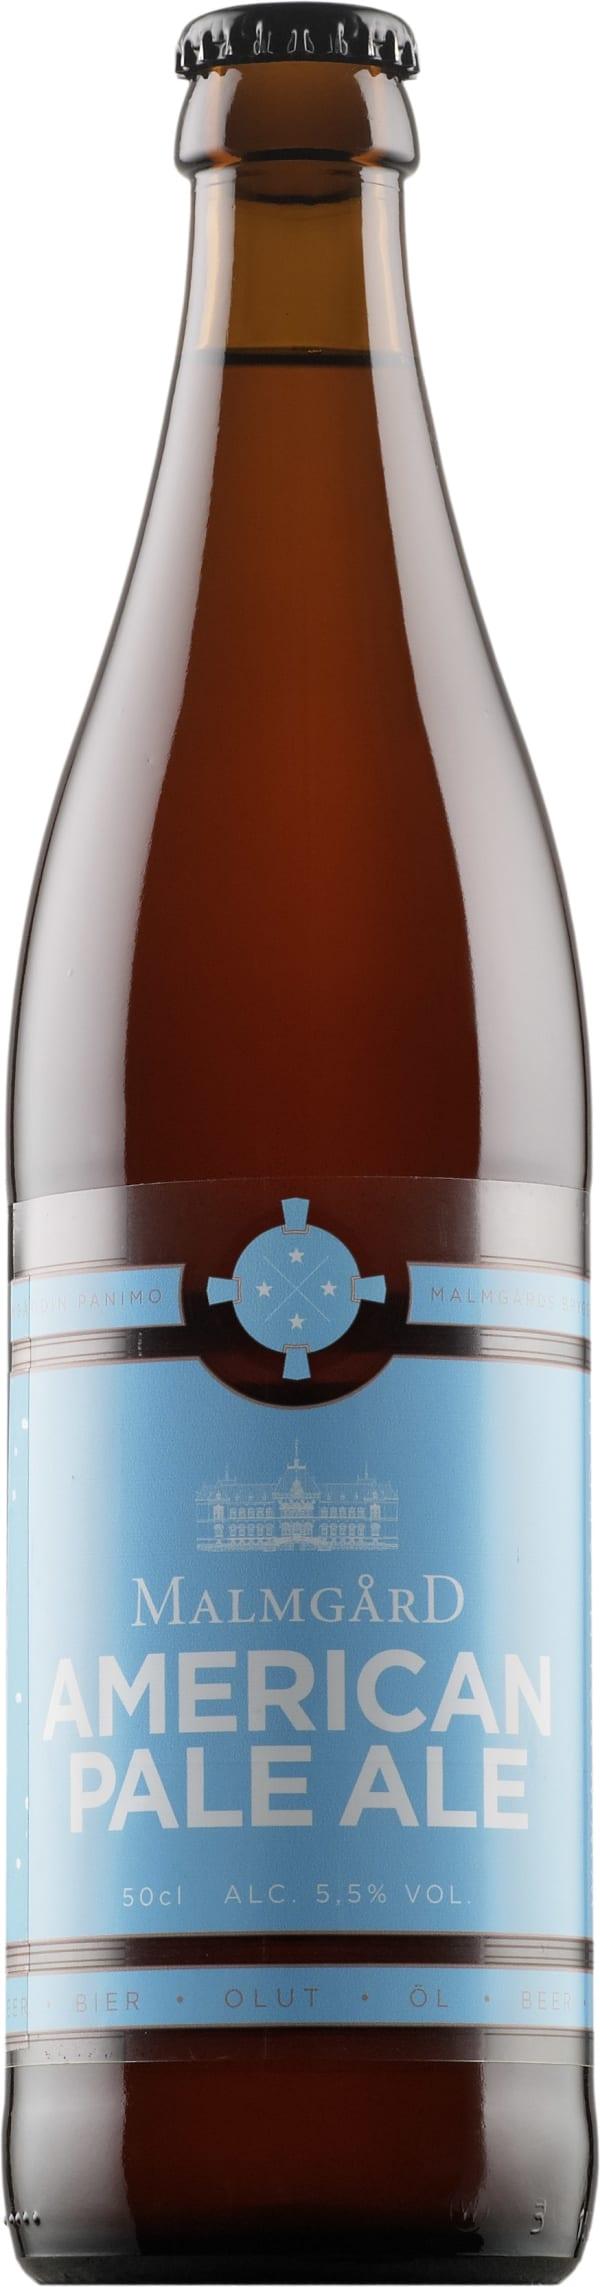 Malmgård American Pale Ale